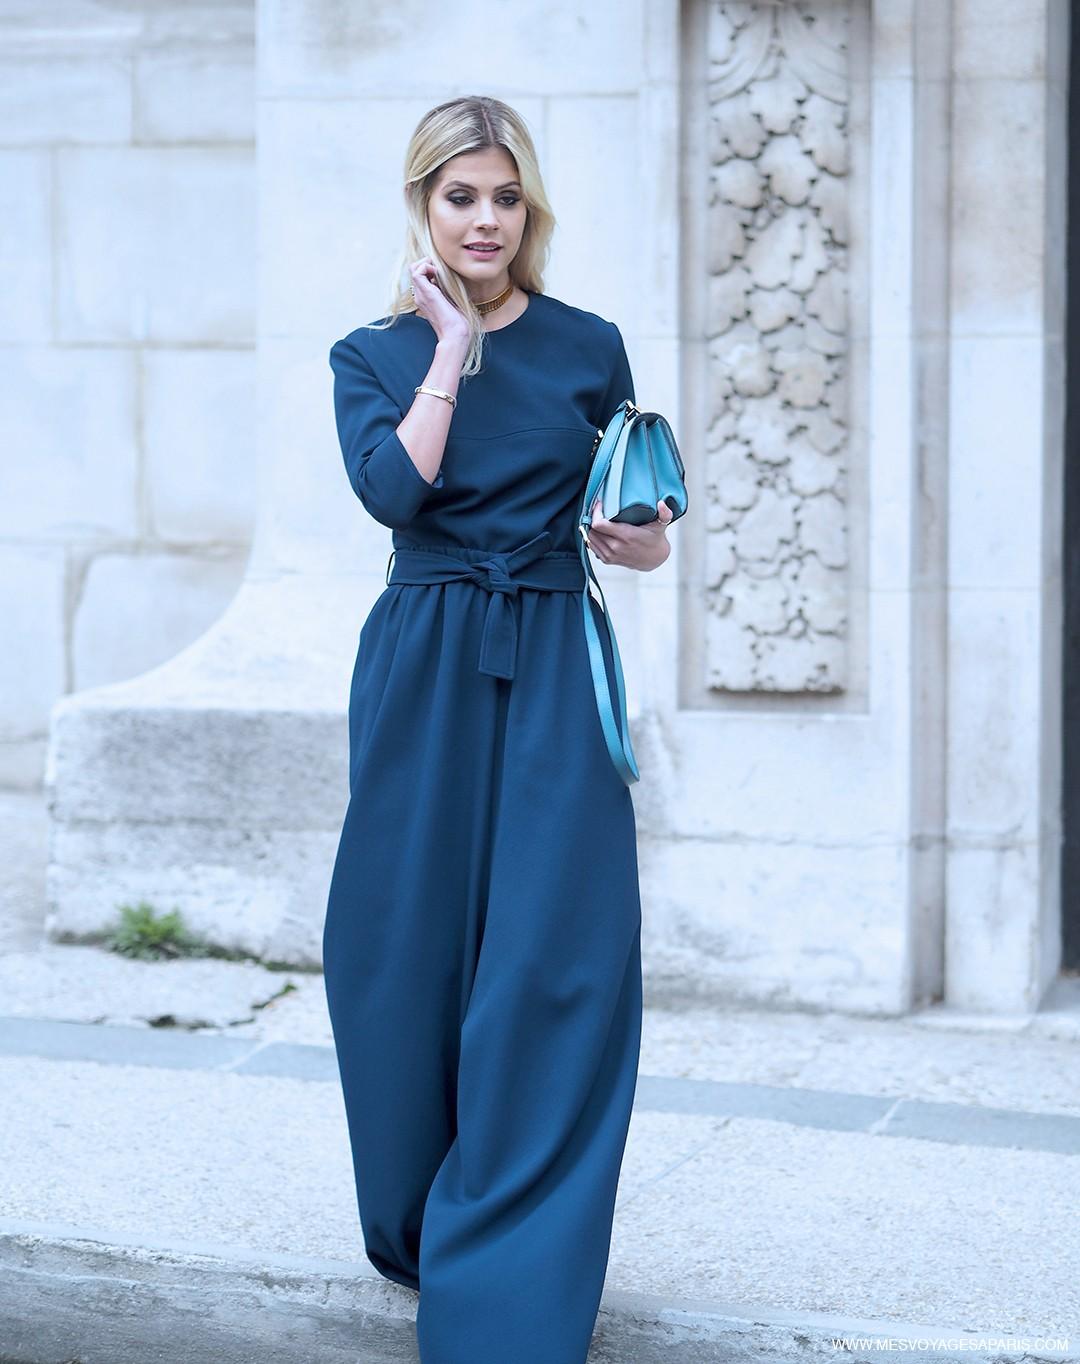 paris-fashion-week-street-style-september-2016pa011226-copia